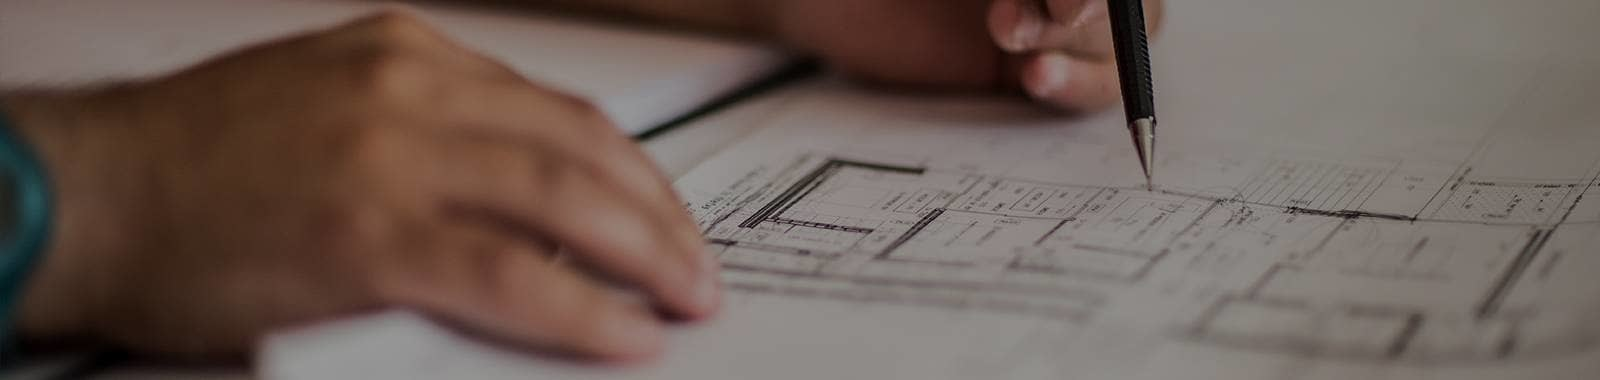 Architect professional liability insurance plan